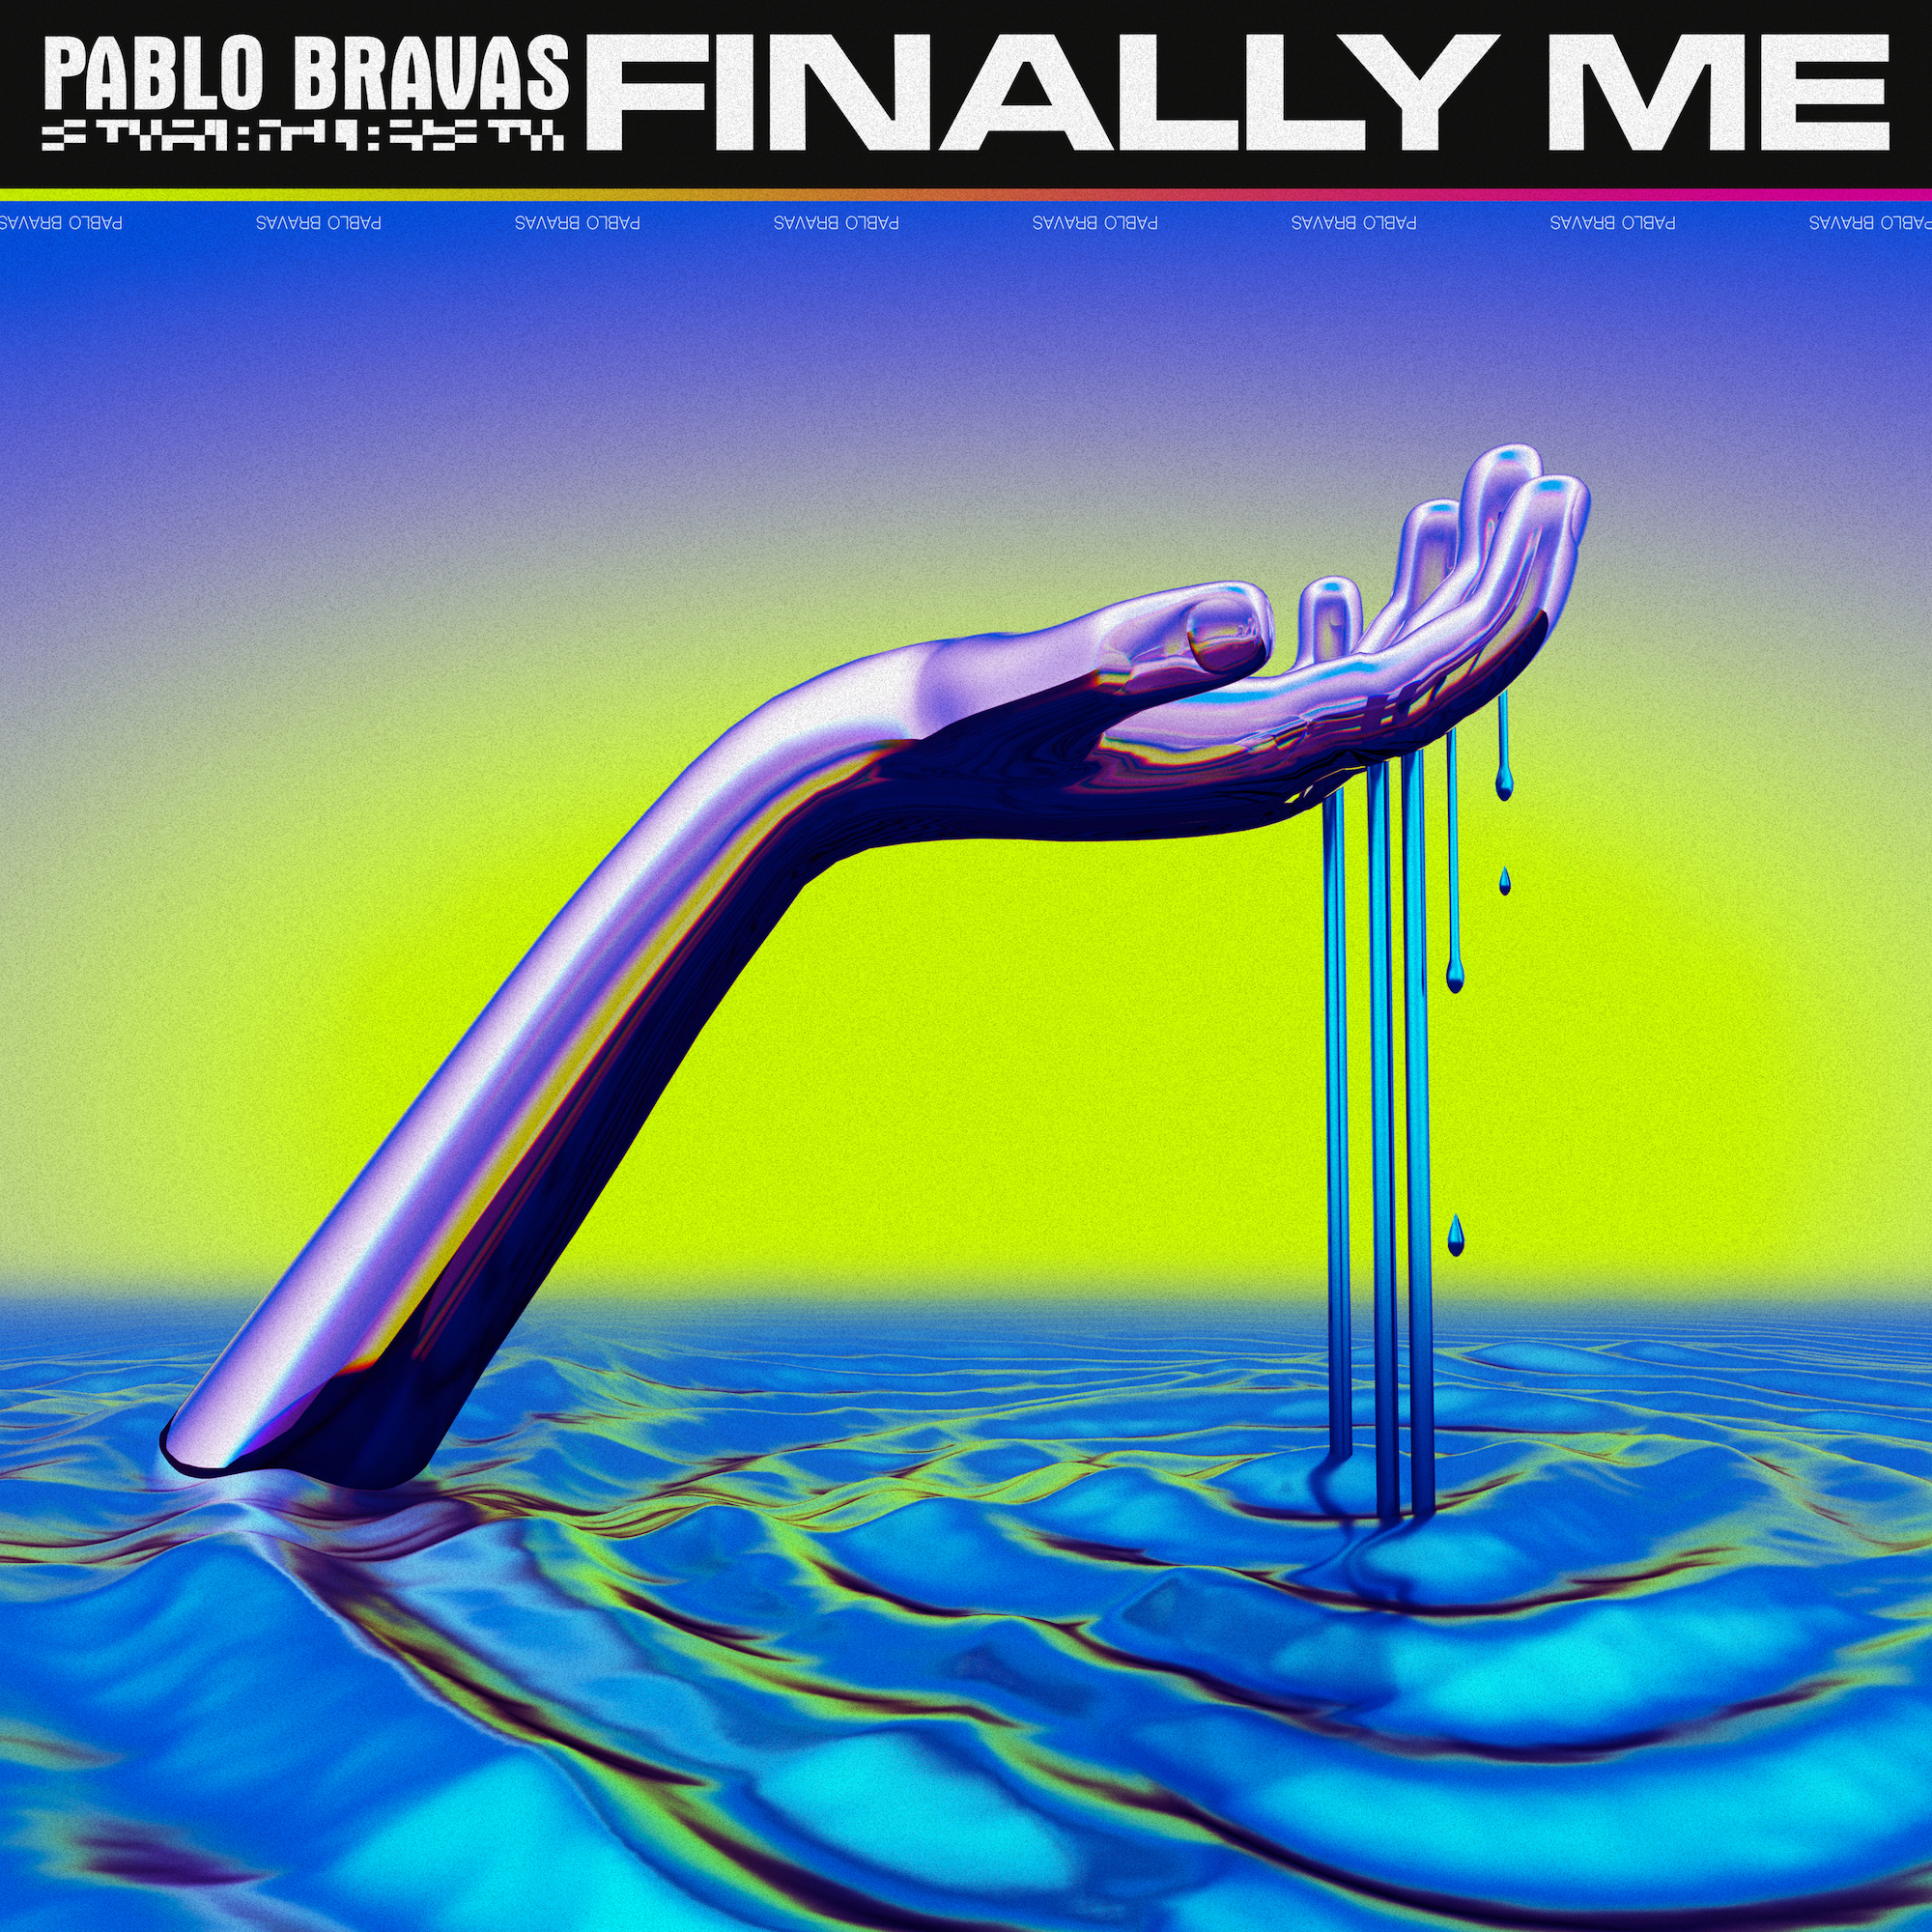 Pablo Bravas returns with new single 'Finally Me' – Music is 4 Lovers